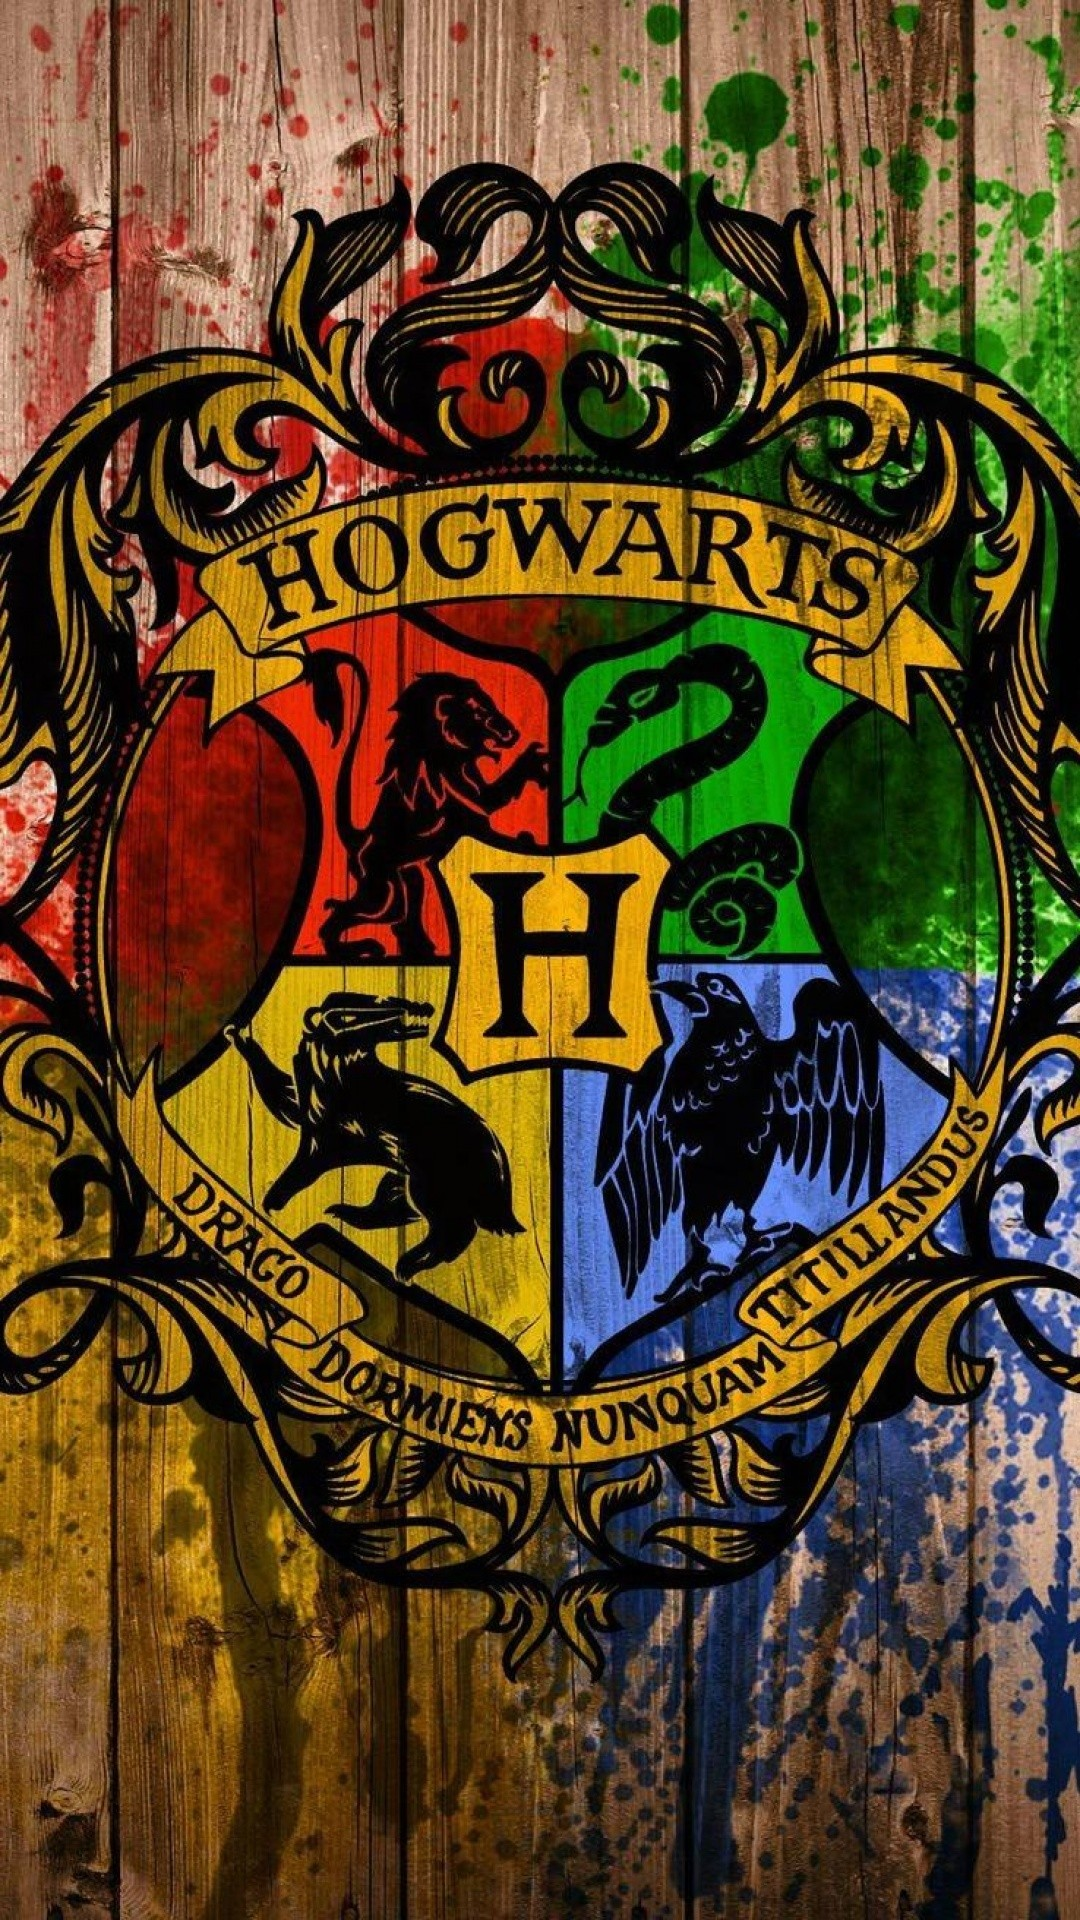 Harry potter wallpaper iphone 0 HTML code. ハリー・ポッター 洋画 映画の壁紙 |  iPhone6Plus壁紙 .